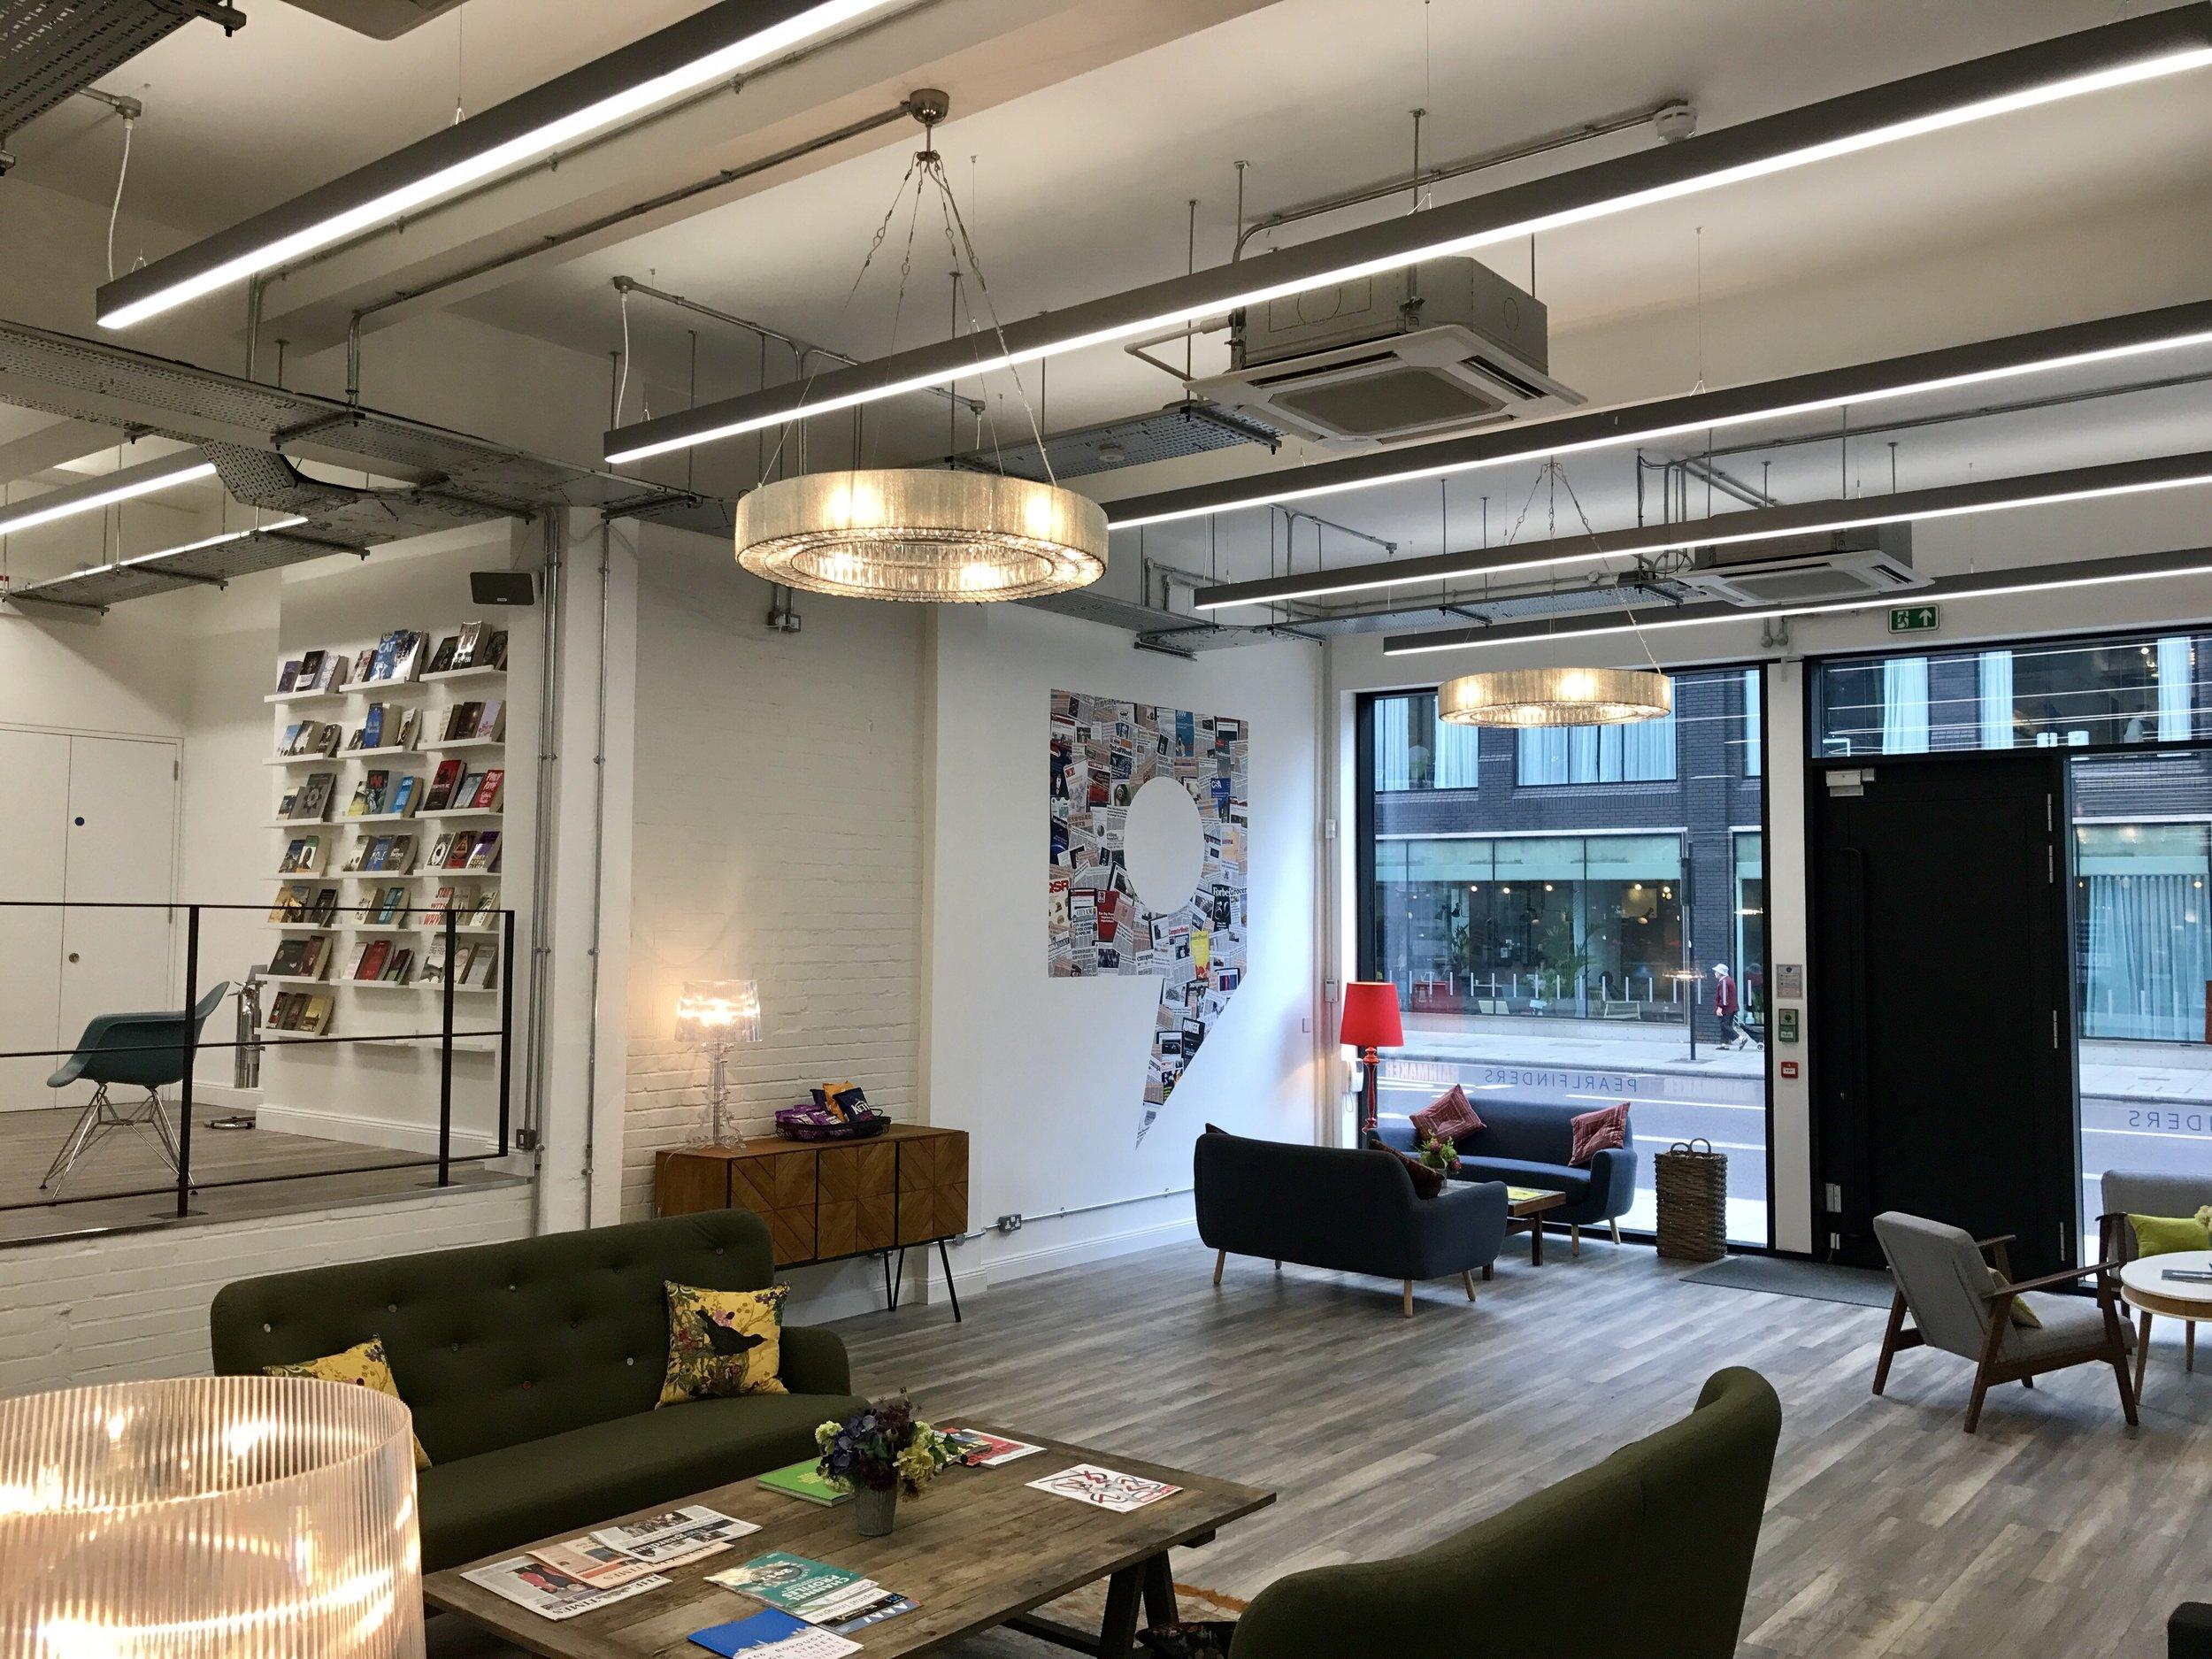 New office Image.jpg